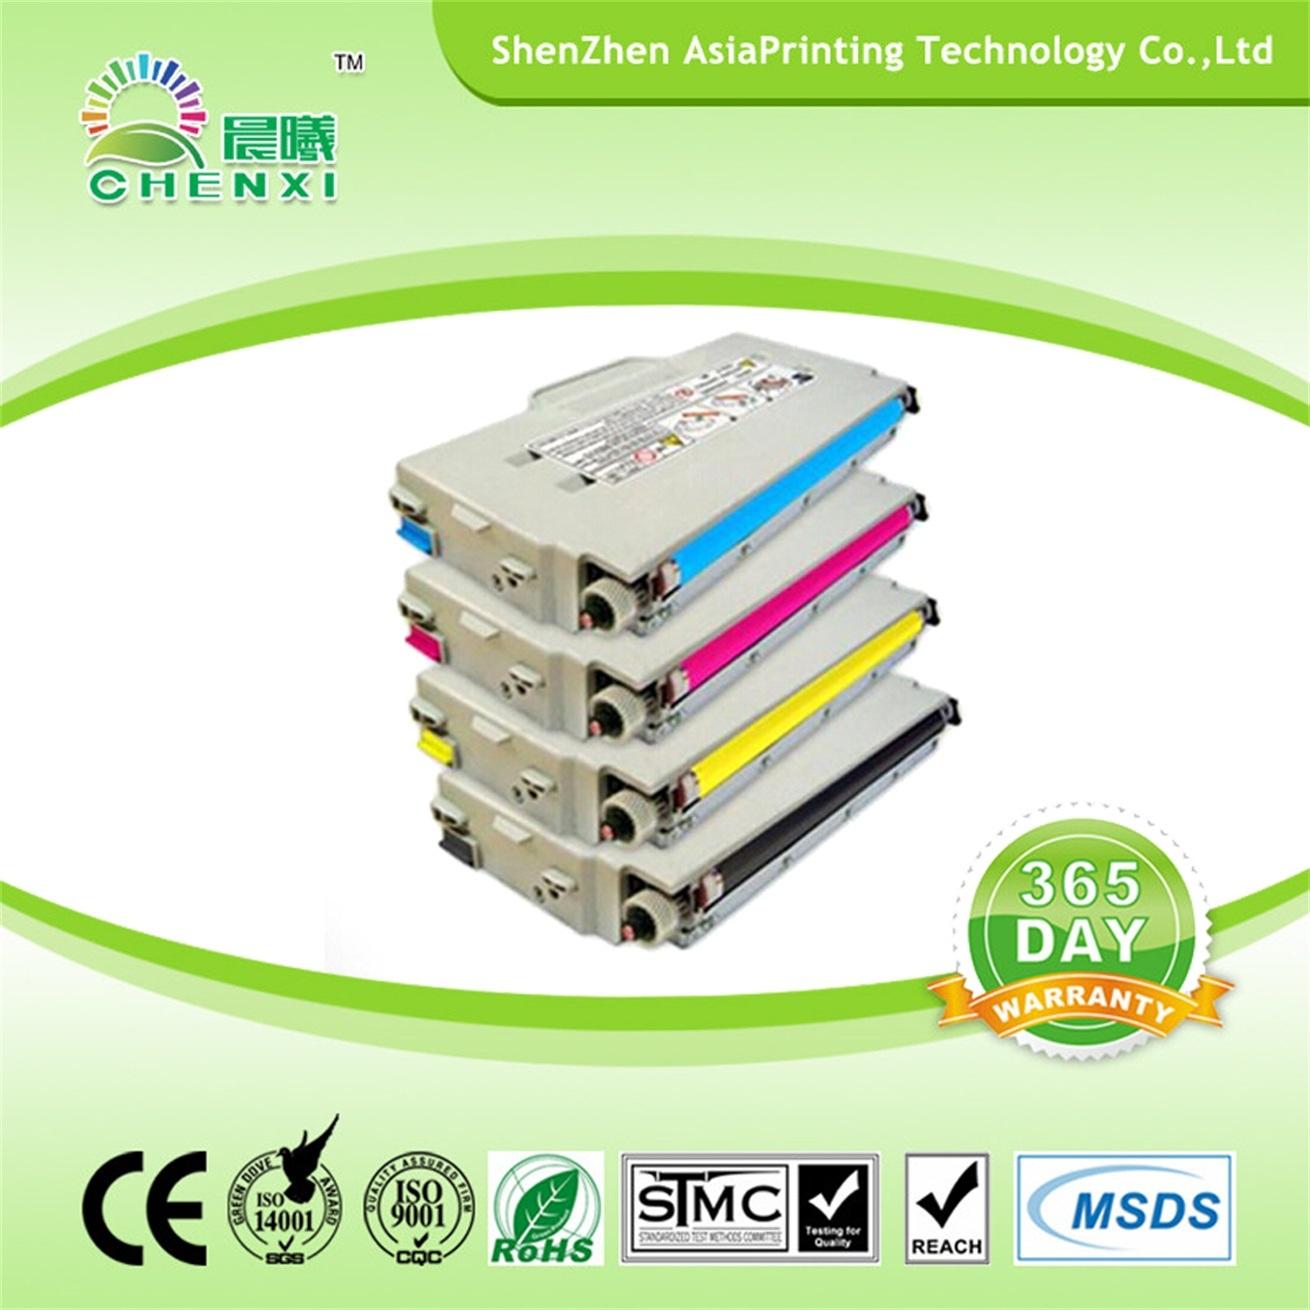 Tn04 Color Toner Cartridge for Brother Hl-2700 MFC-9420